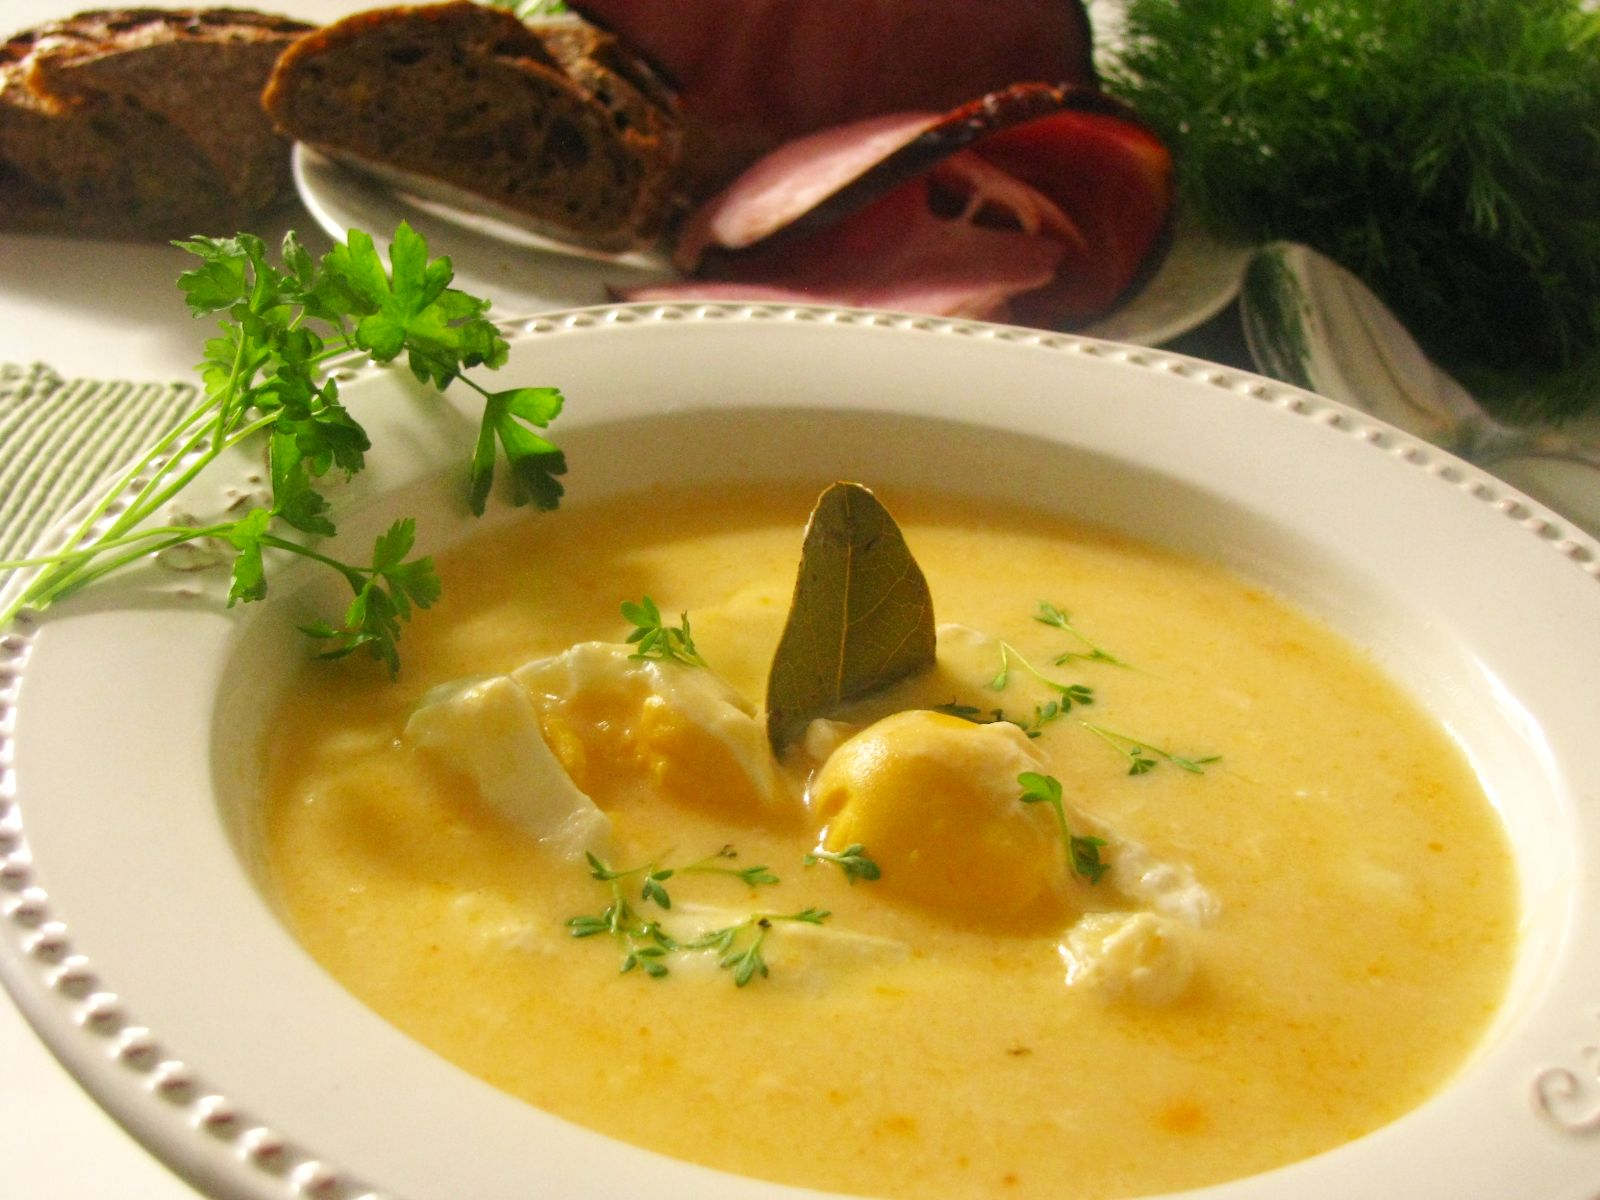 velkonocna polievka horna